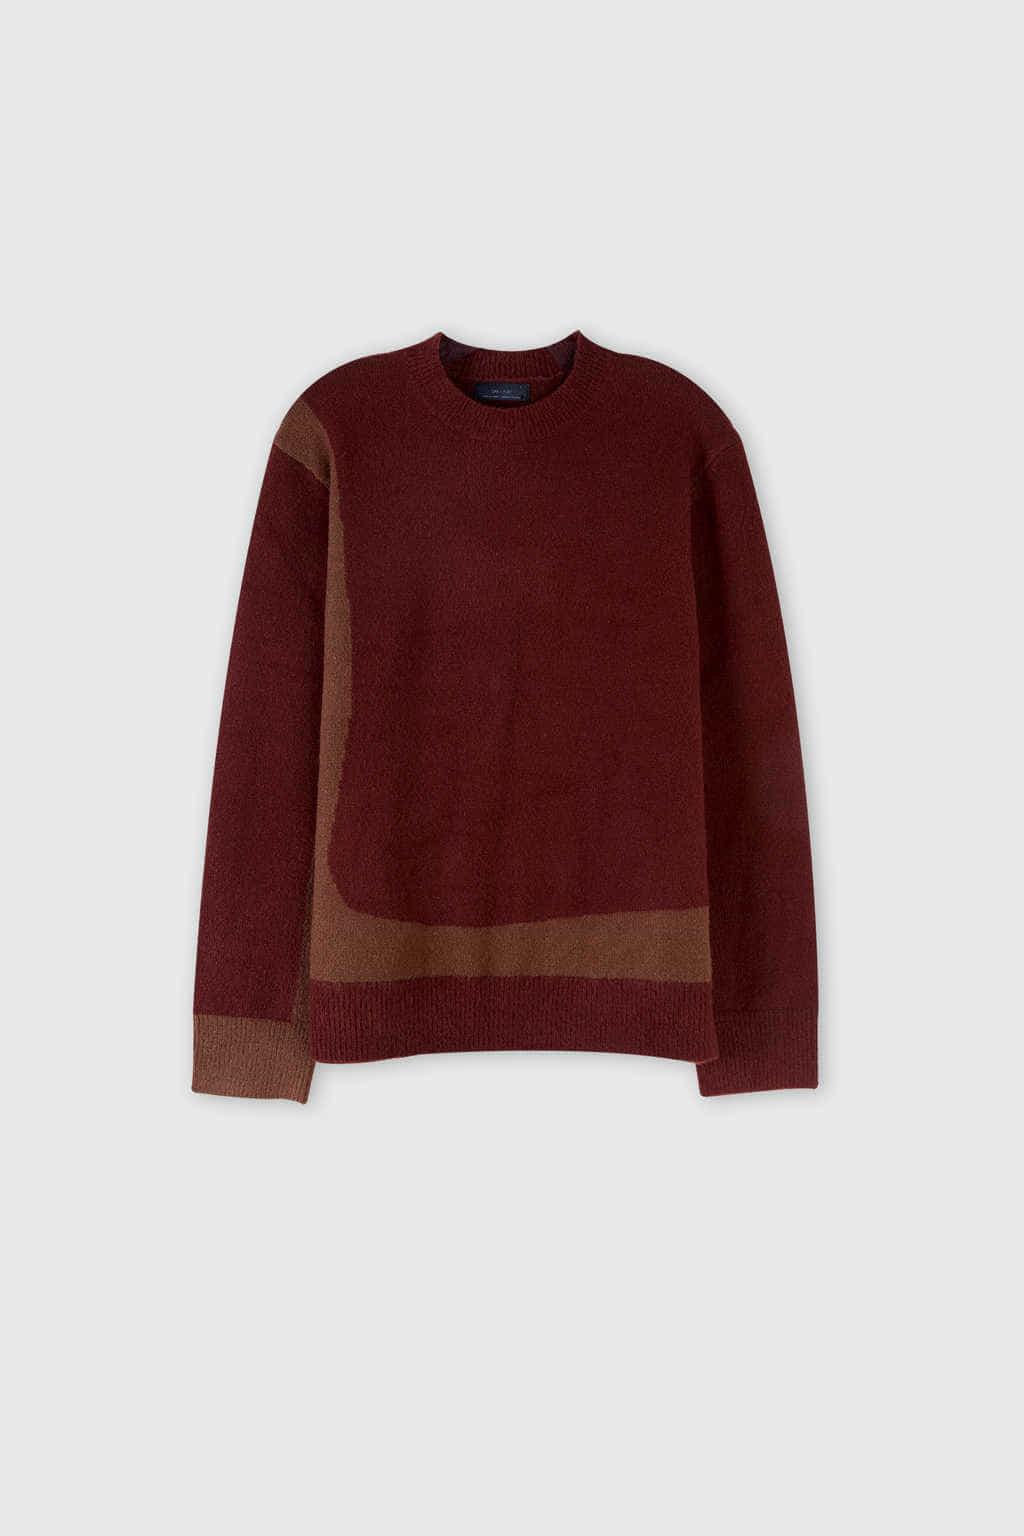 Sweater 2675 Wine 11